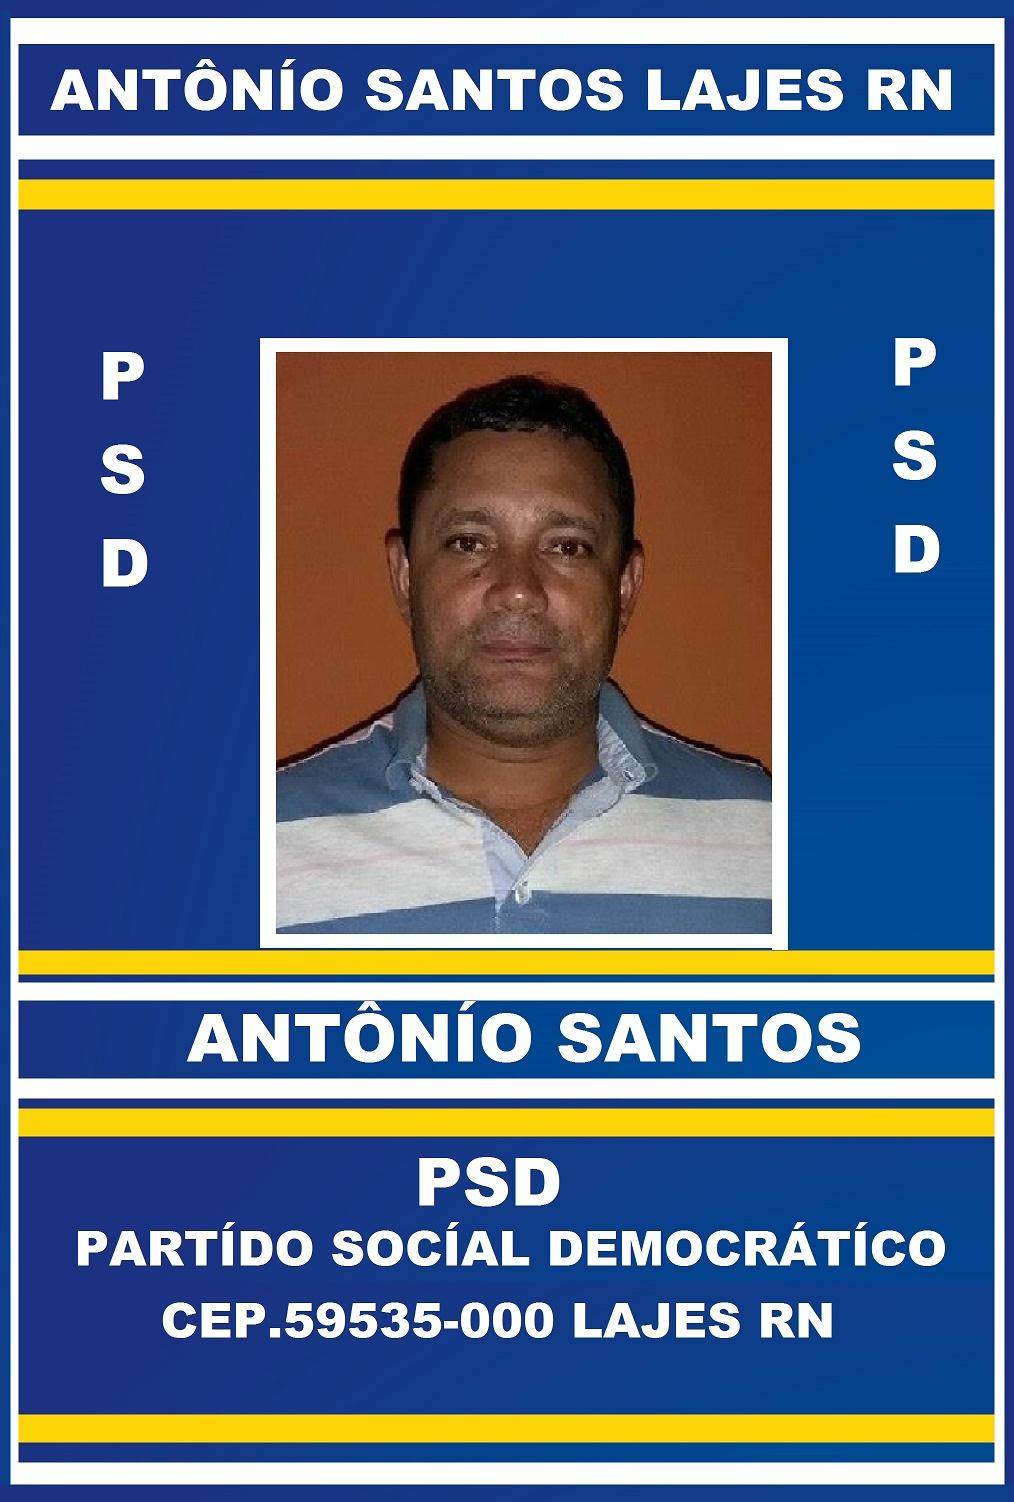 ANTÔNÍO SANTOS PSD LAJES RN